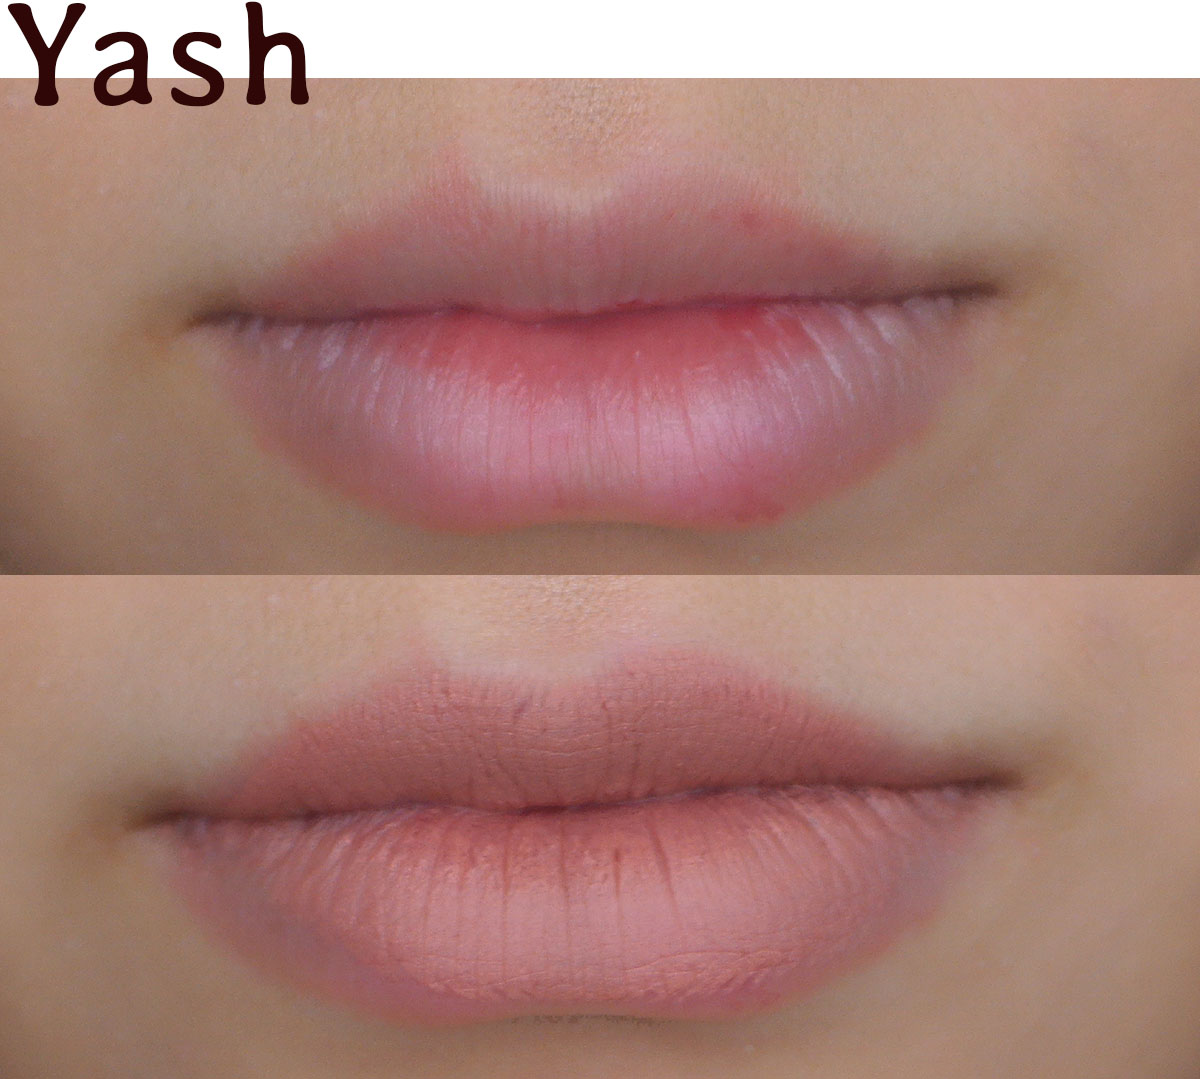 Zeer REVIEW: MAC Artificially Wild Lipsticks – Icon, Yash & Photo #VR06